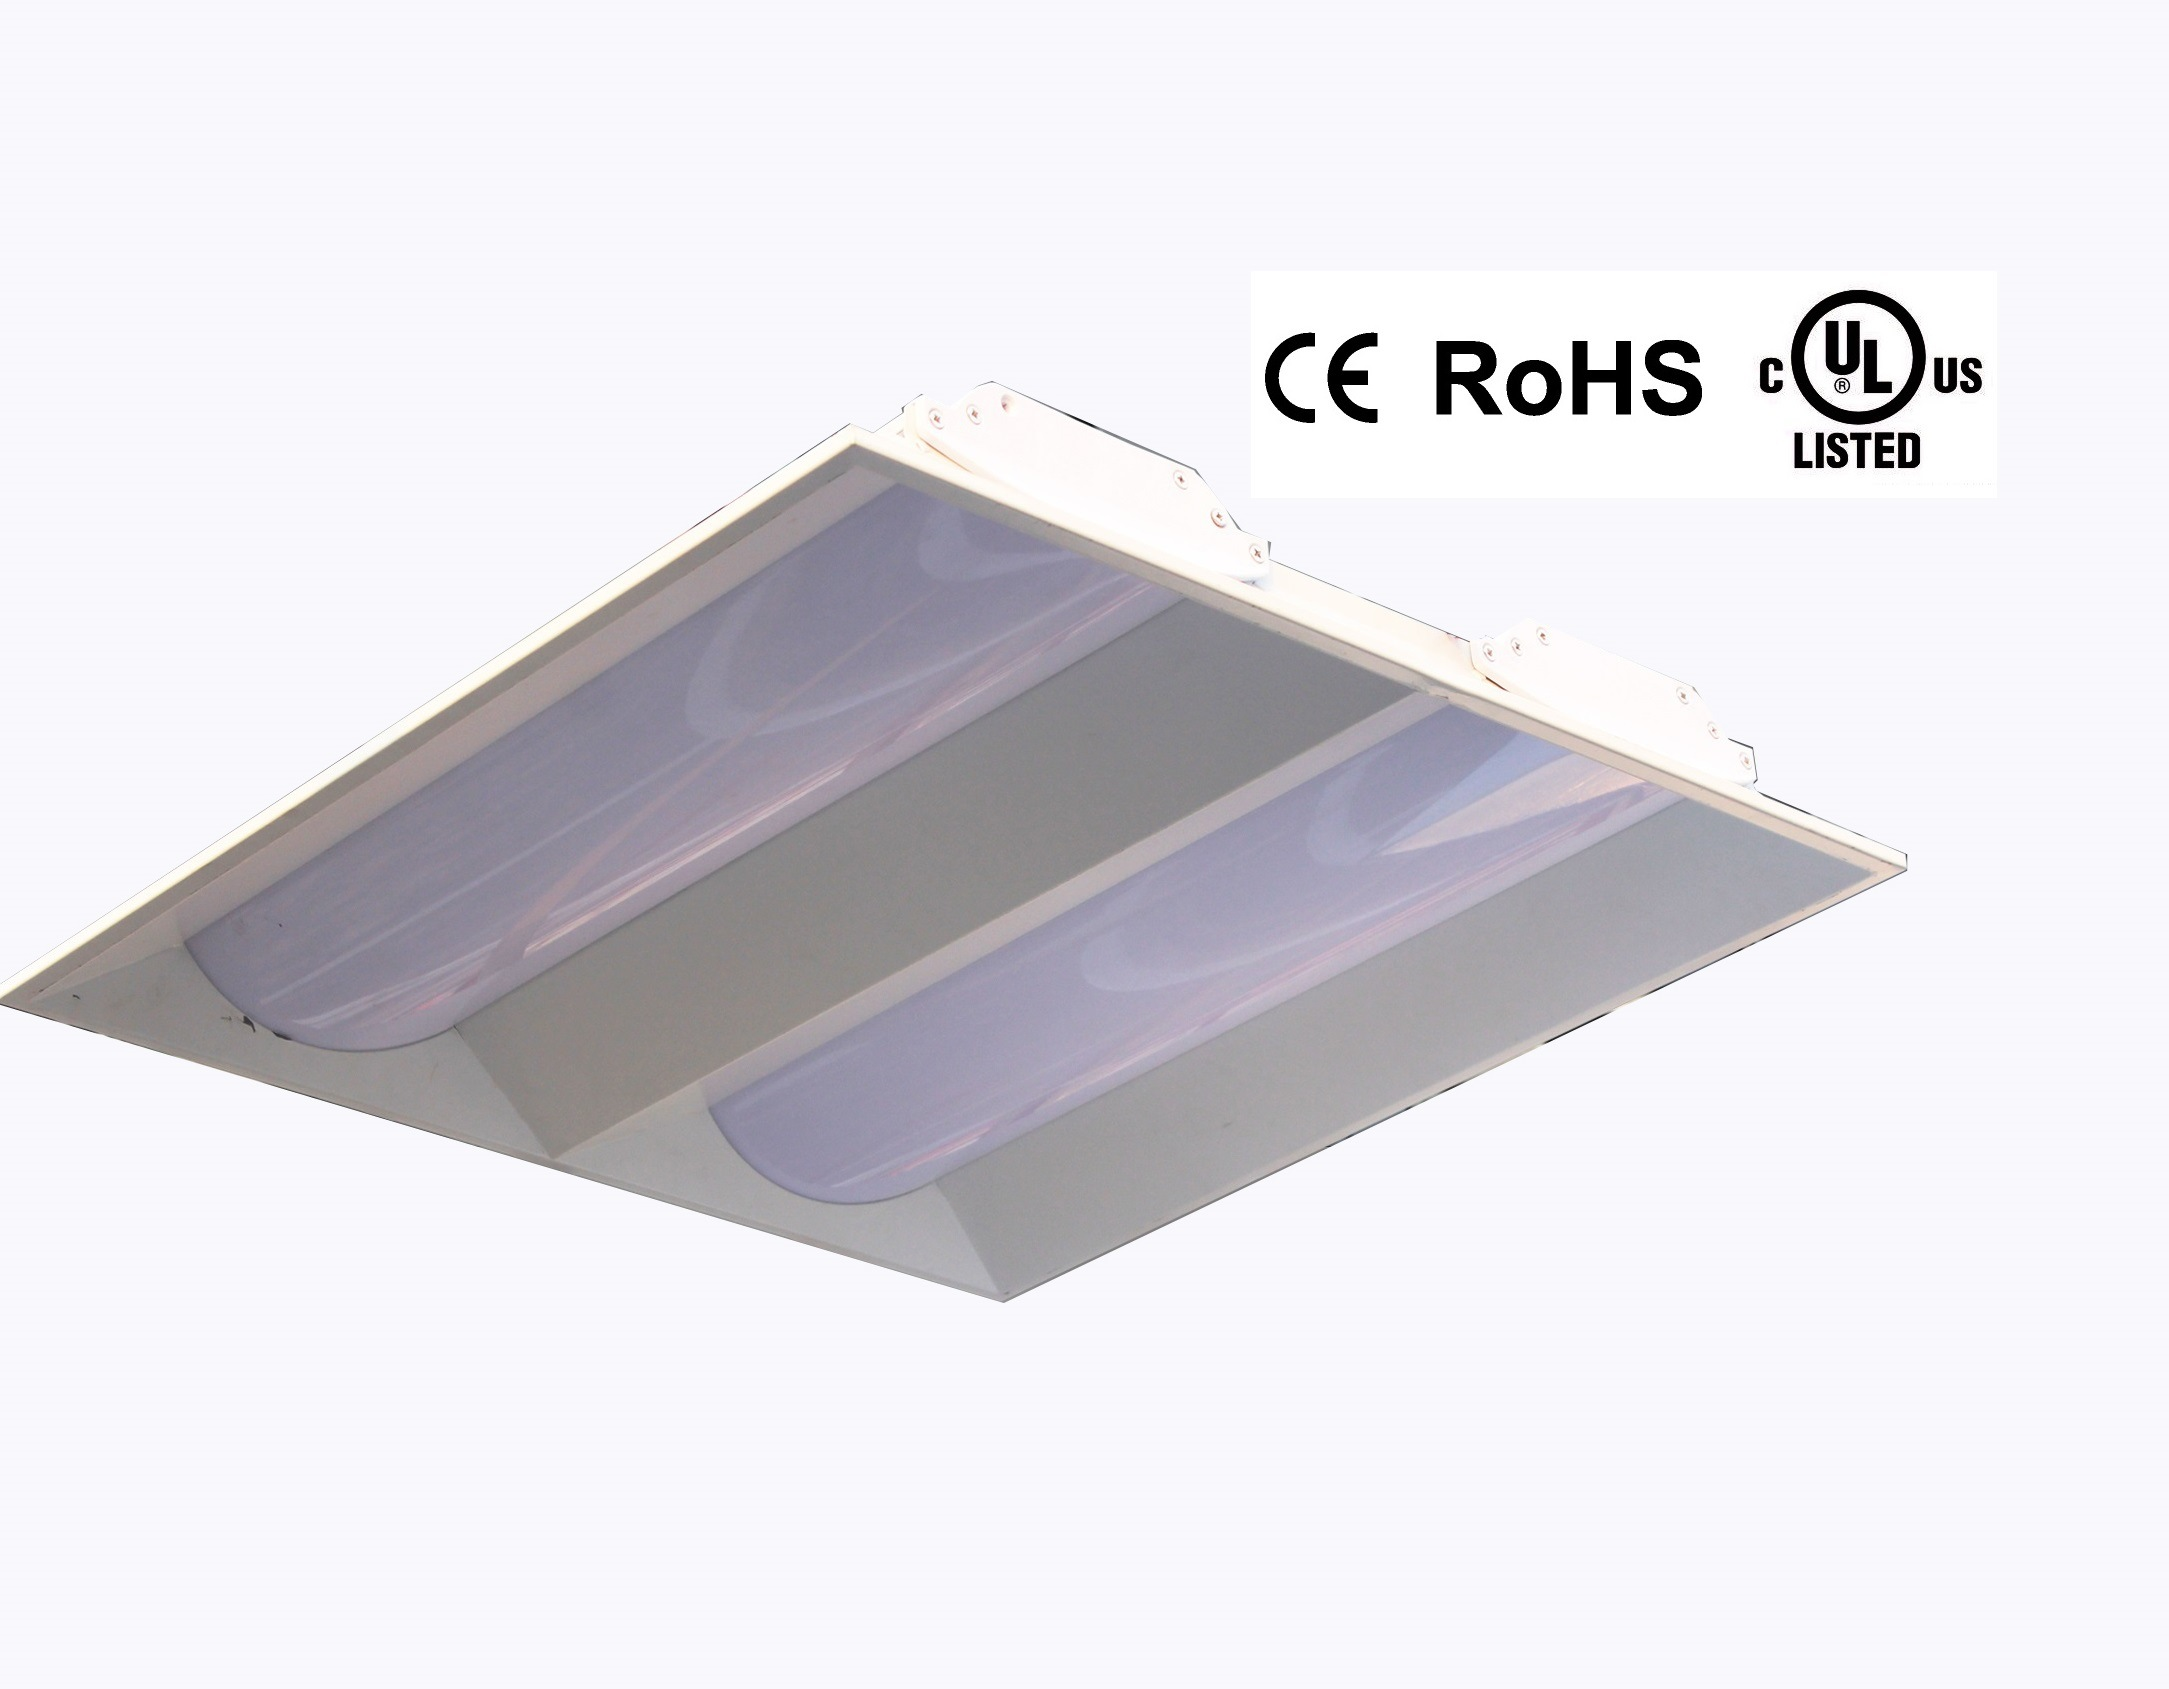 20W 40W 60W Ce RoHS UL Premium Basket LED Recessed Troffer